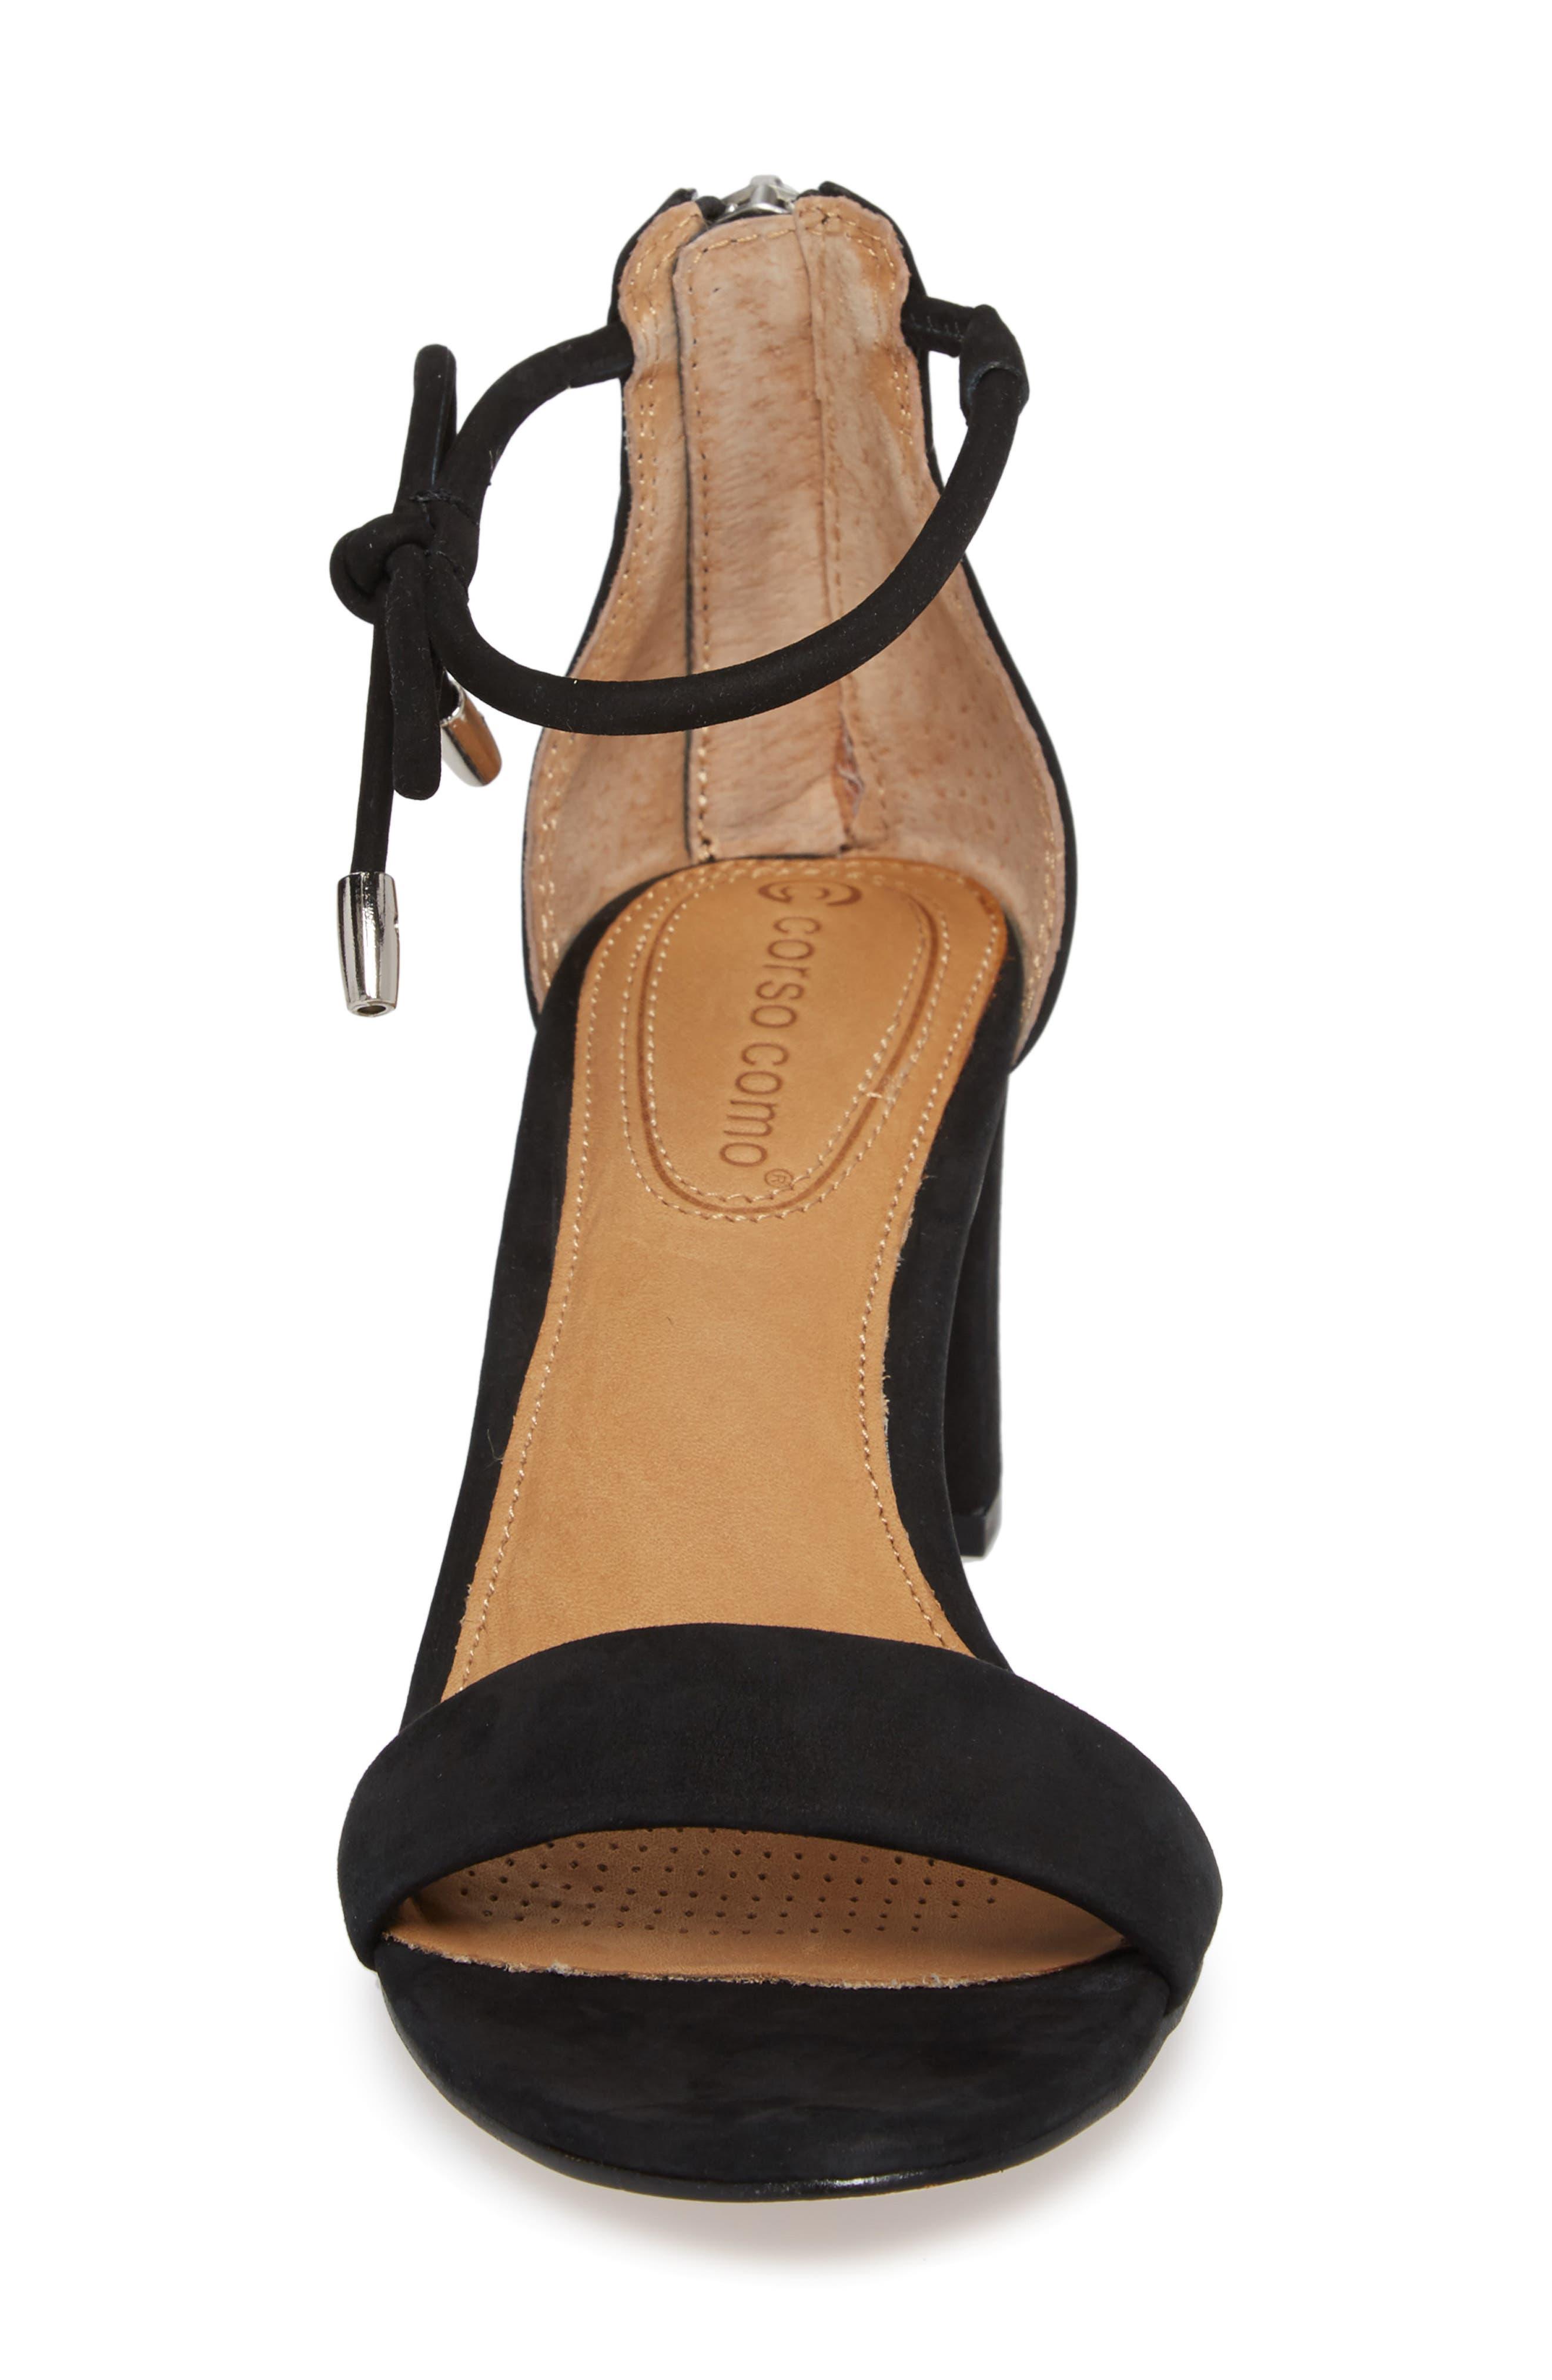 Celebratt Ankle Strap Sandal,                             Alternate thumbnail 4, color,                             BLACK NUBUCK LEATHER